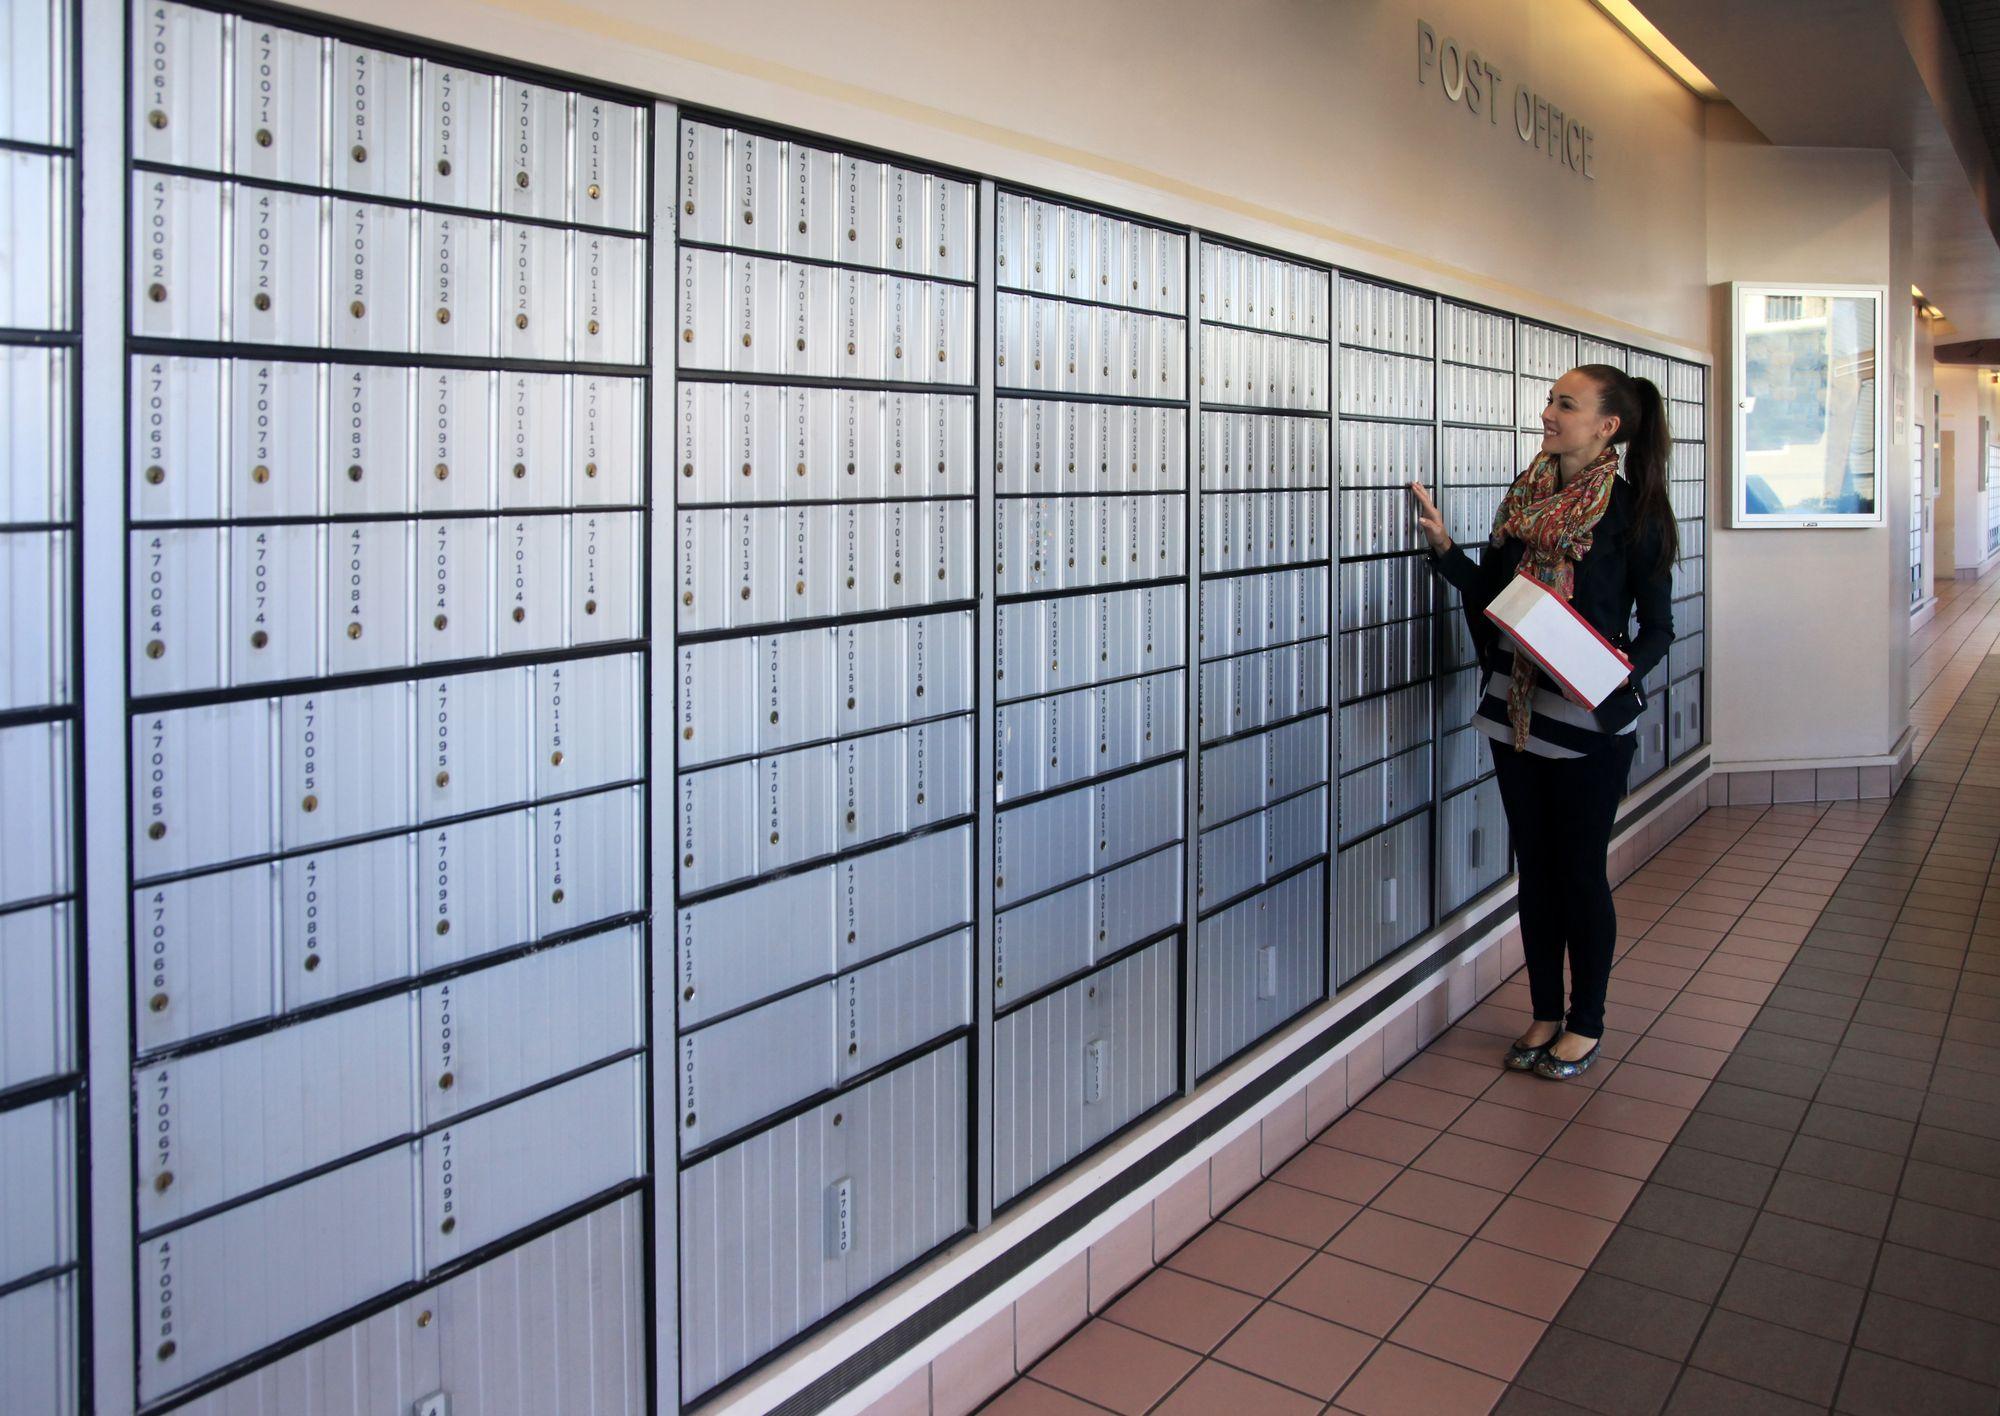 3103a18819a867fbe8b4808b4c197692 - How To Get A Po Box At A Post Office